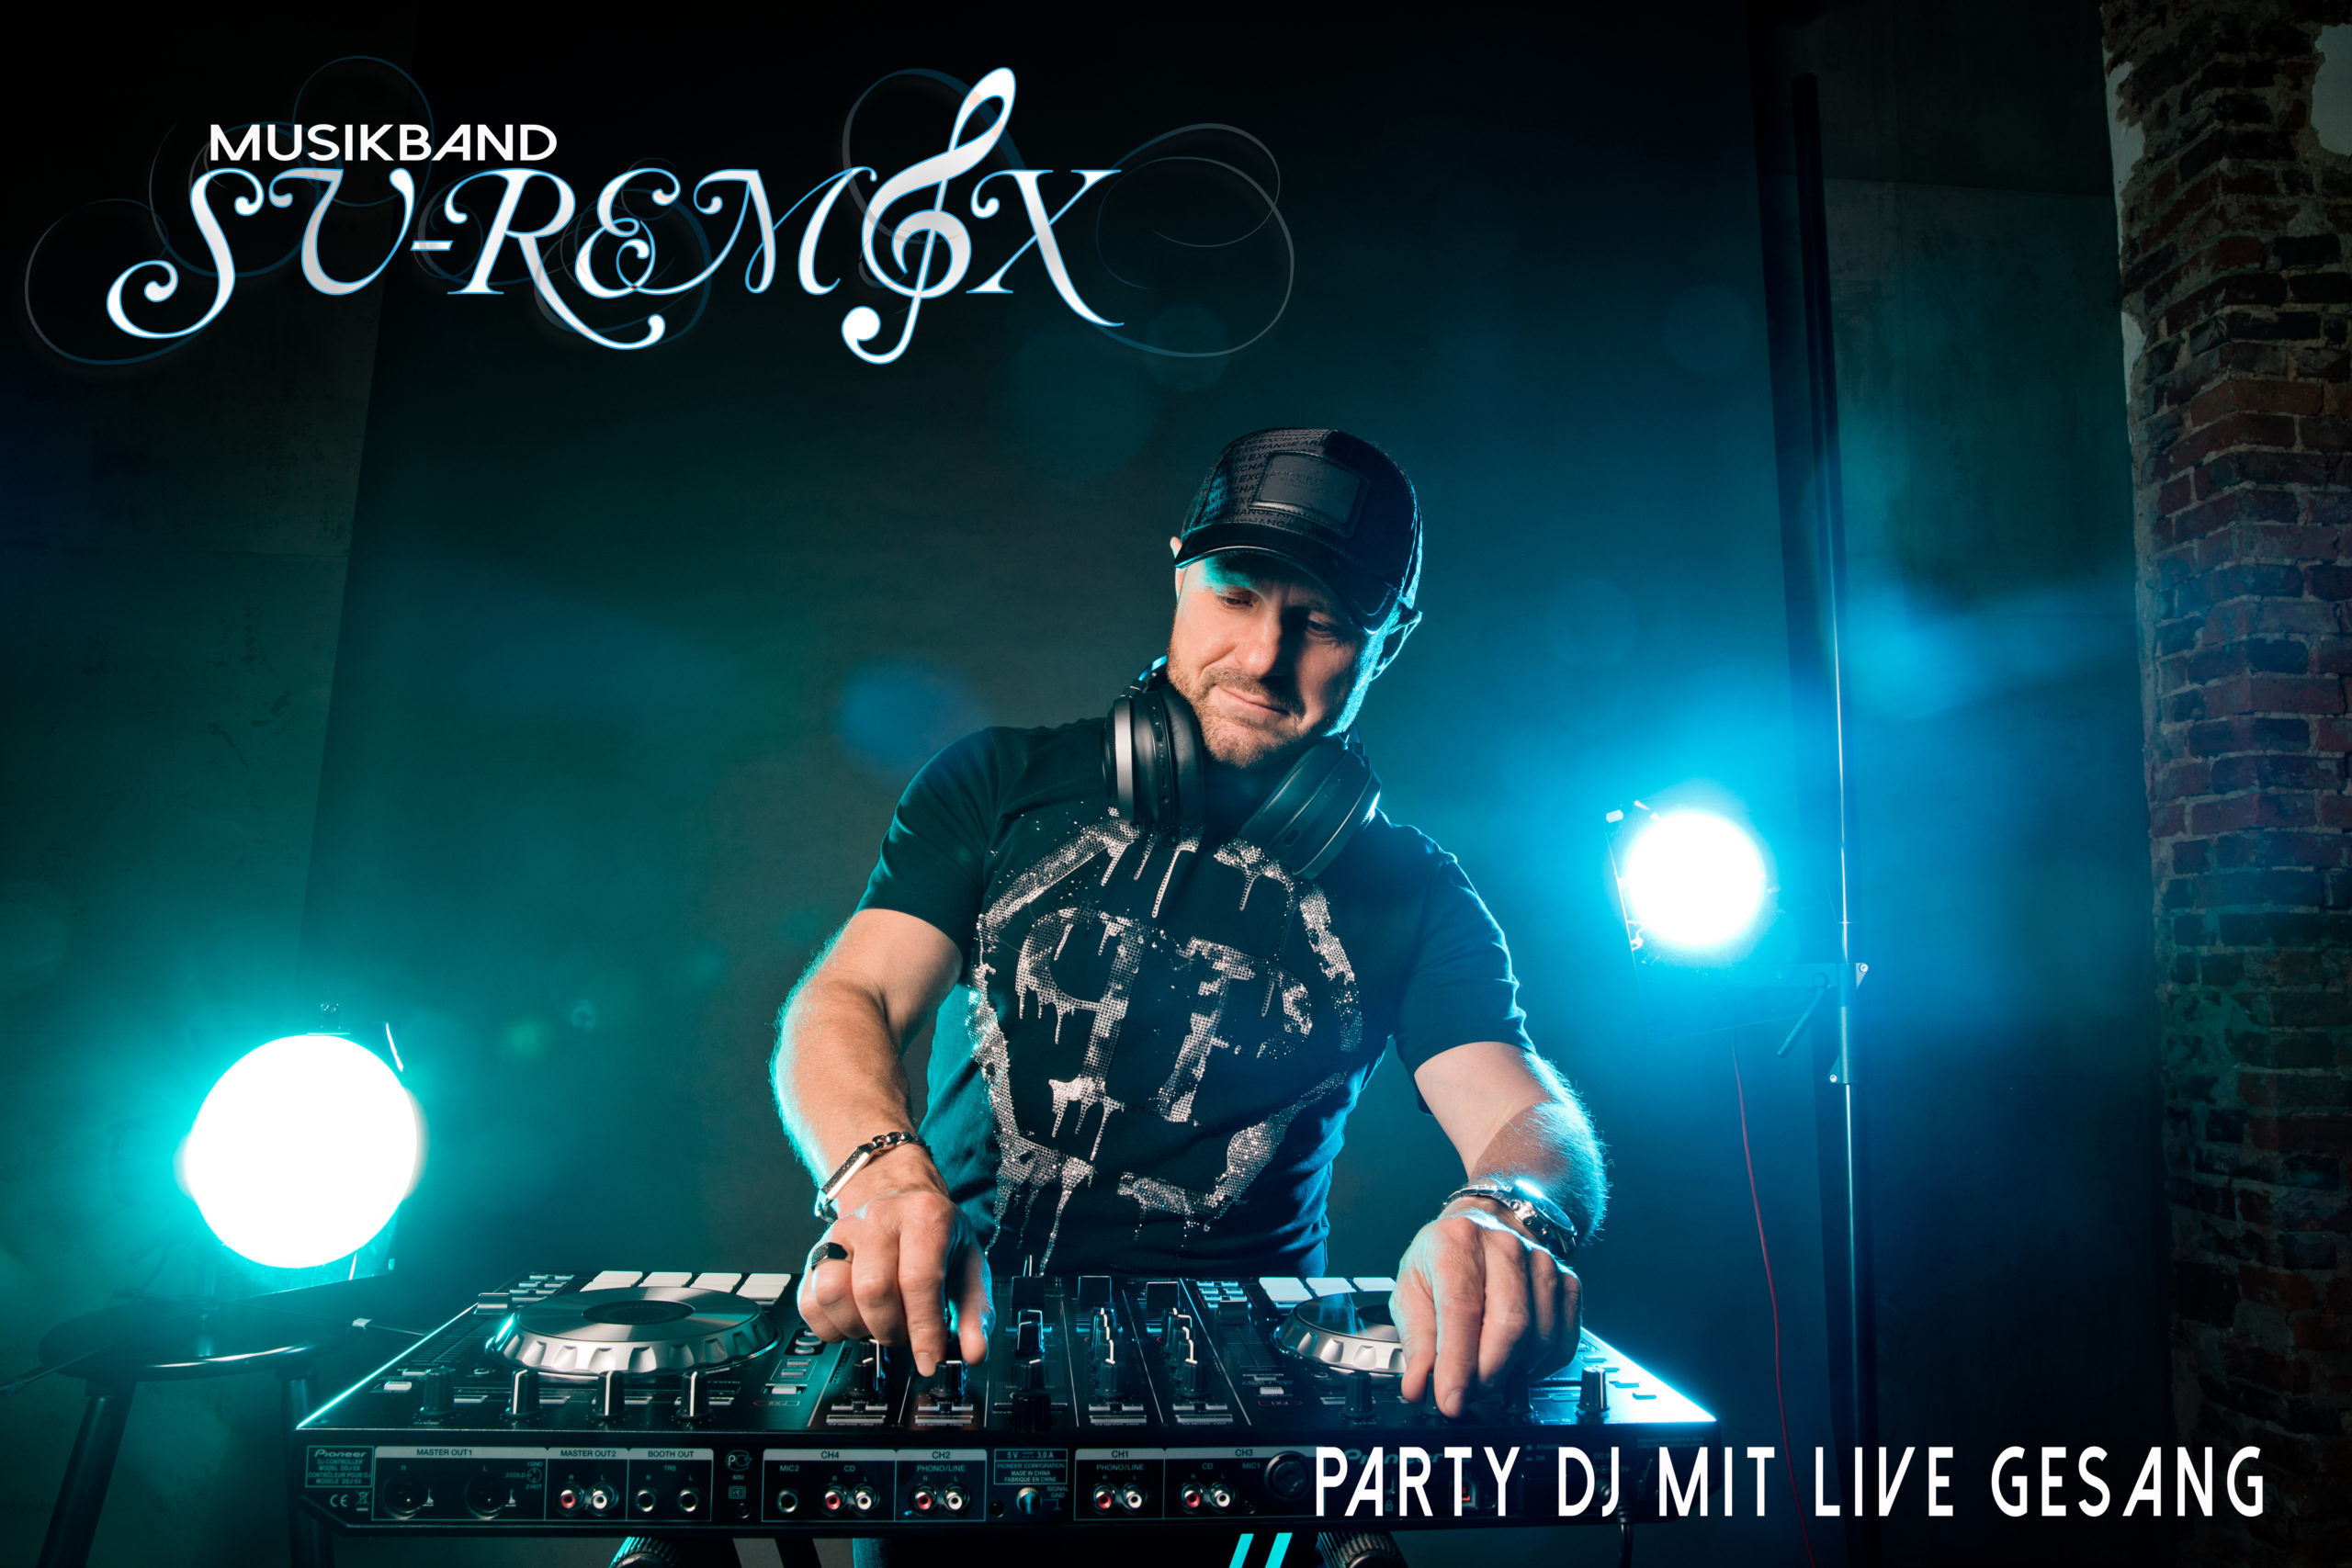 Party DJ mit Live Gesang